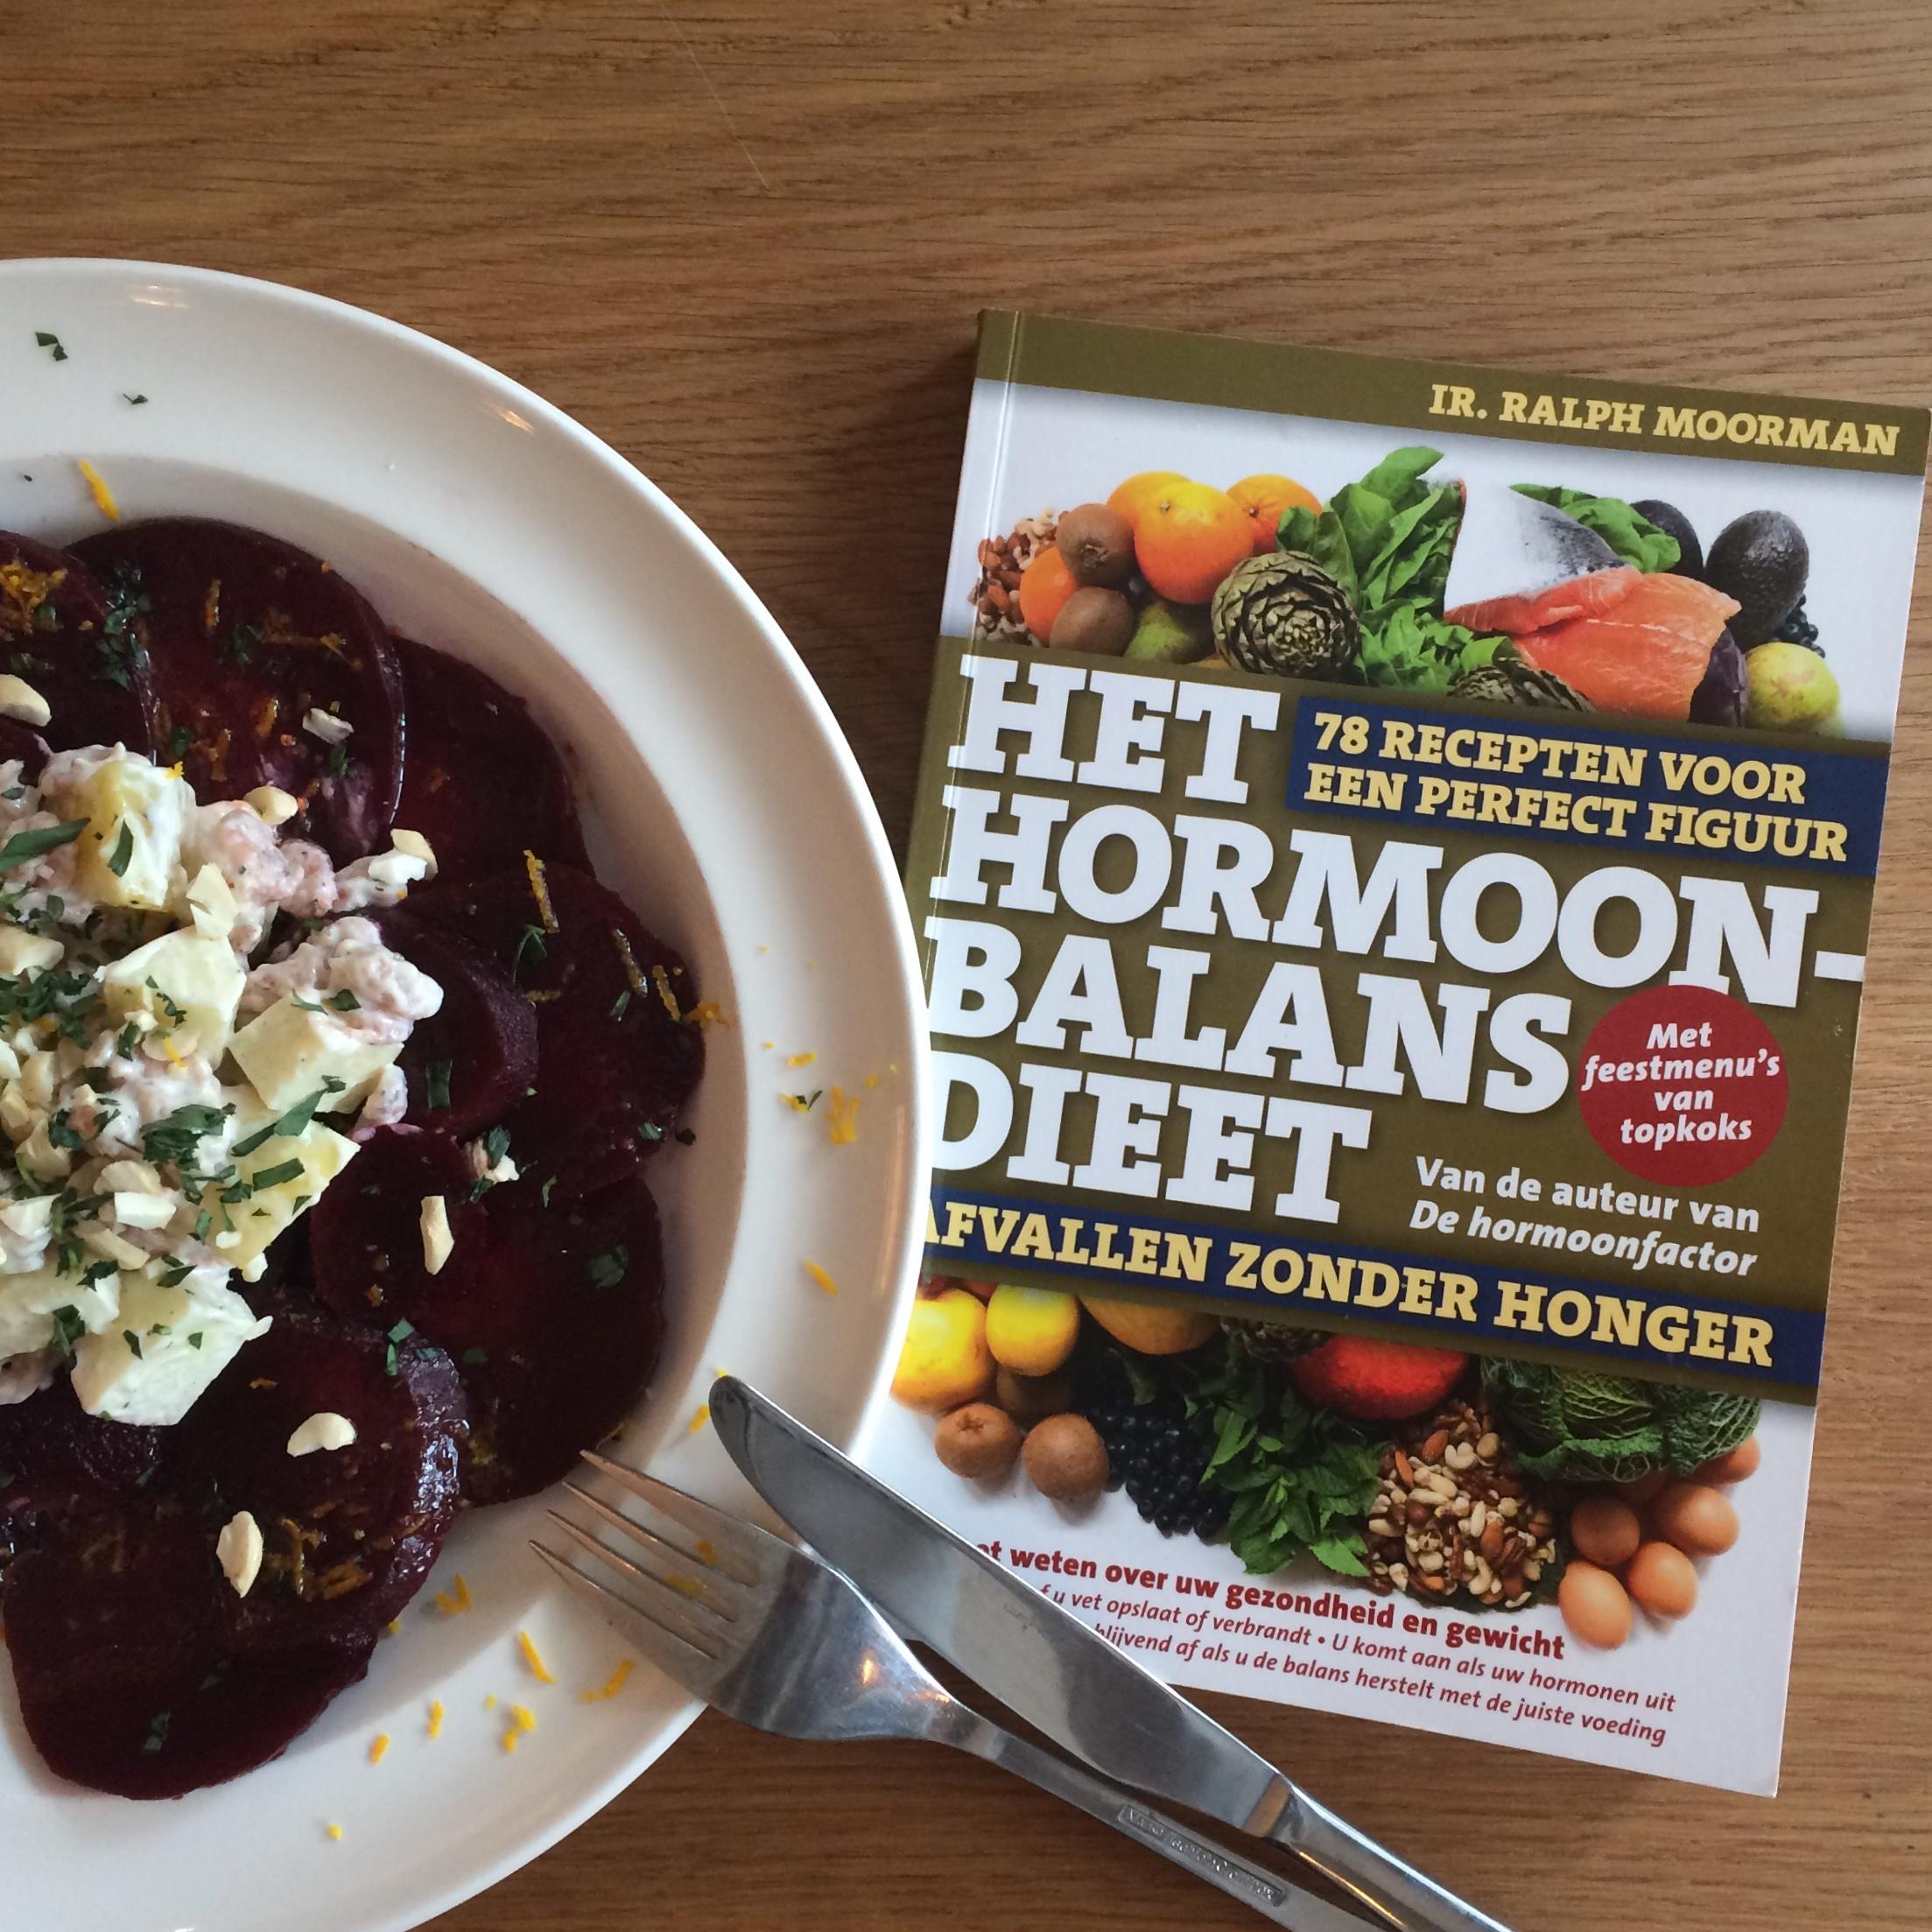 hormoonbalans dieet ervaringen